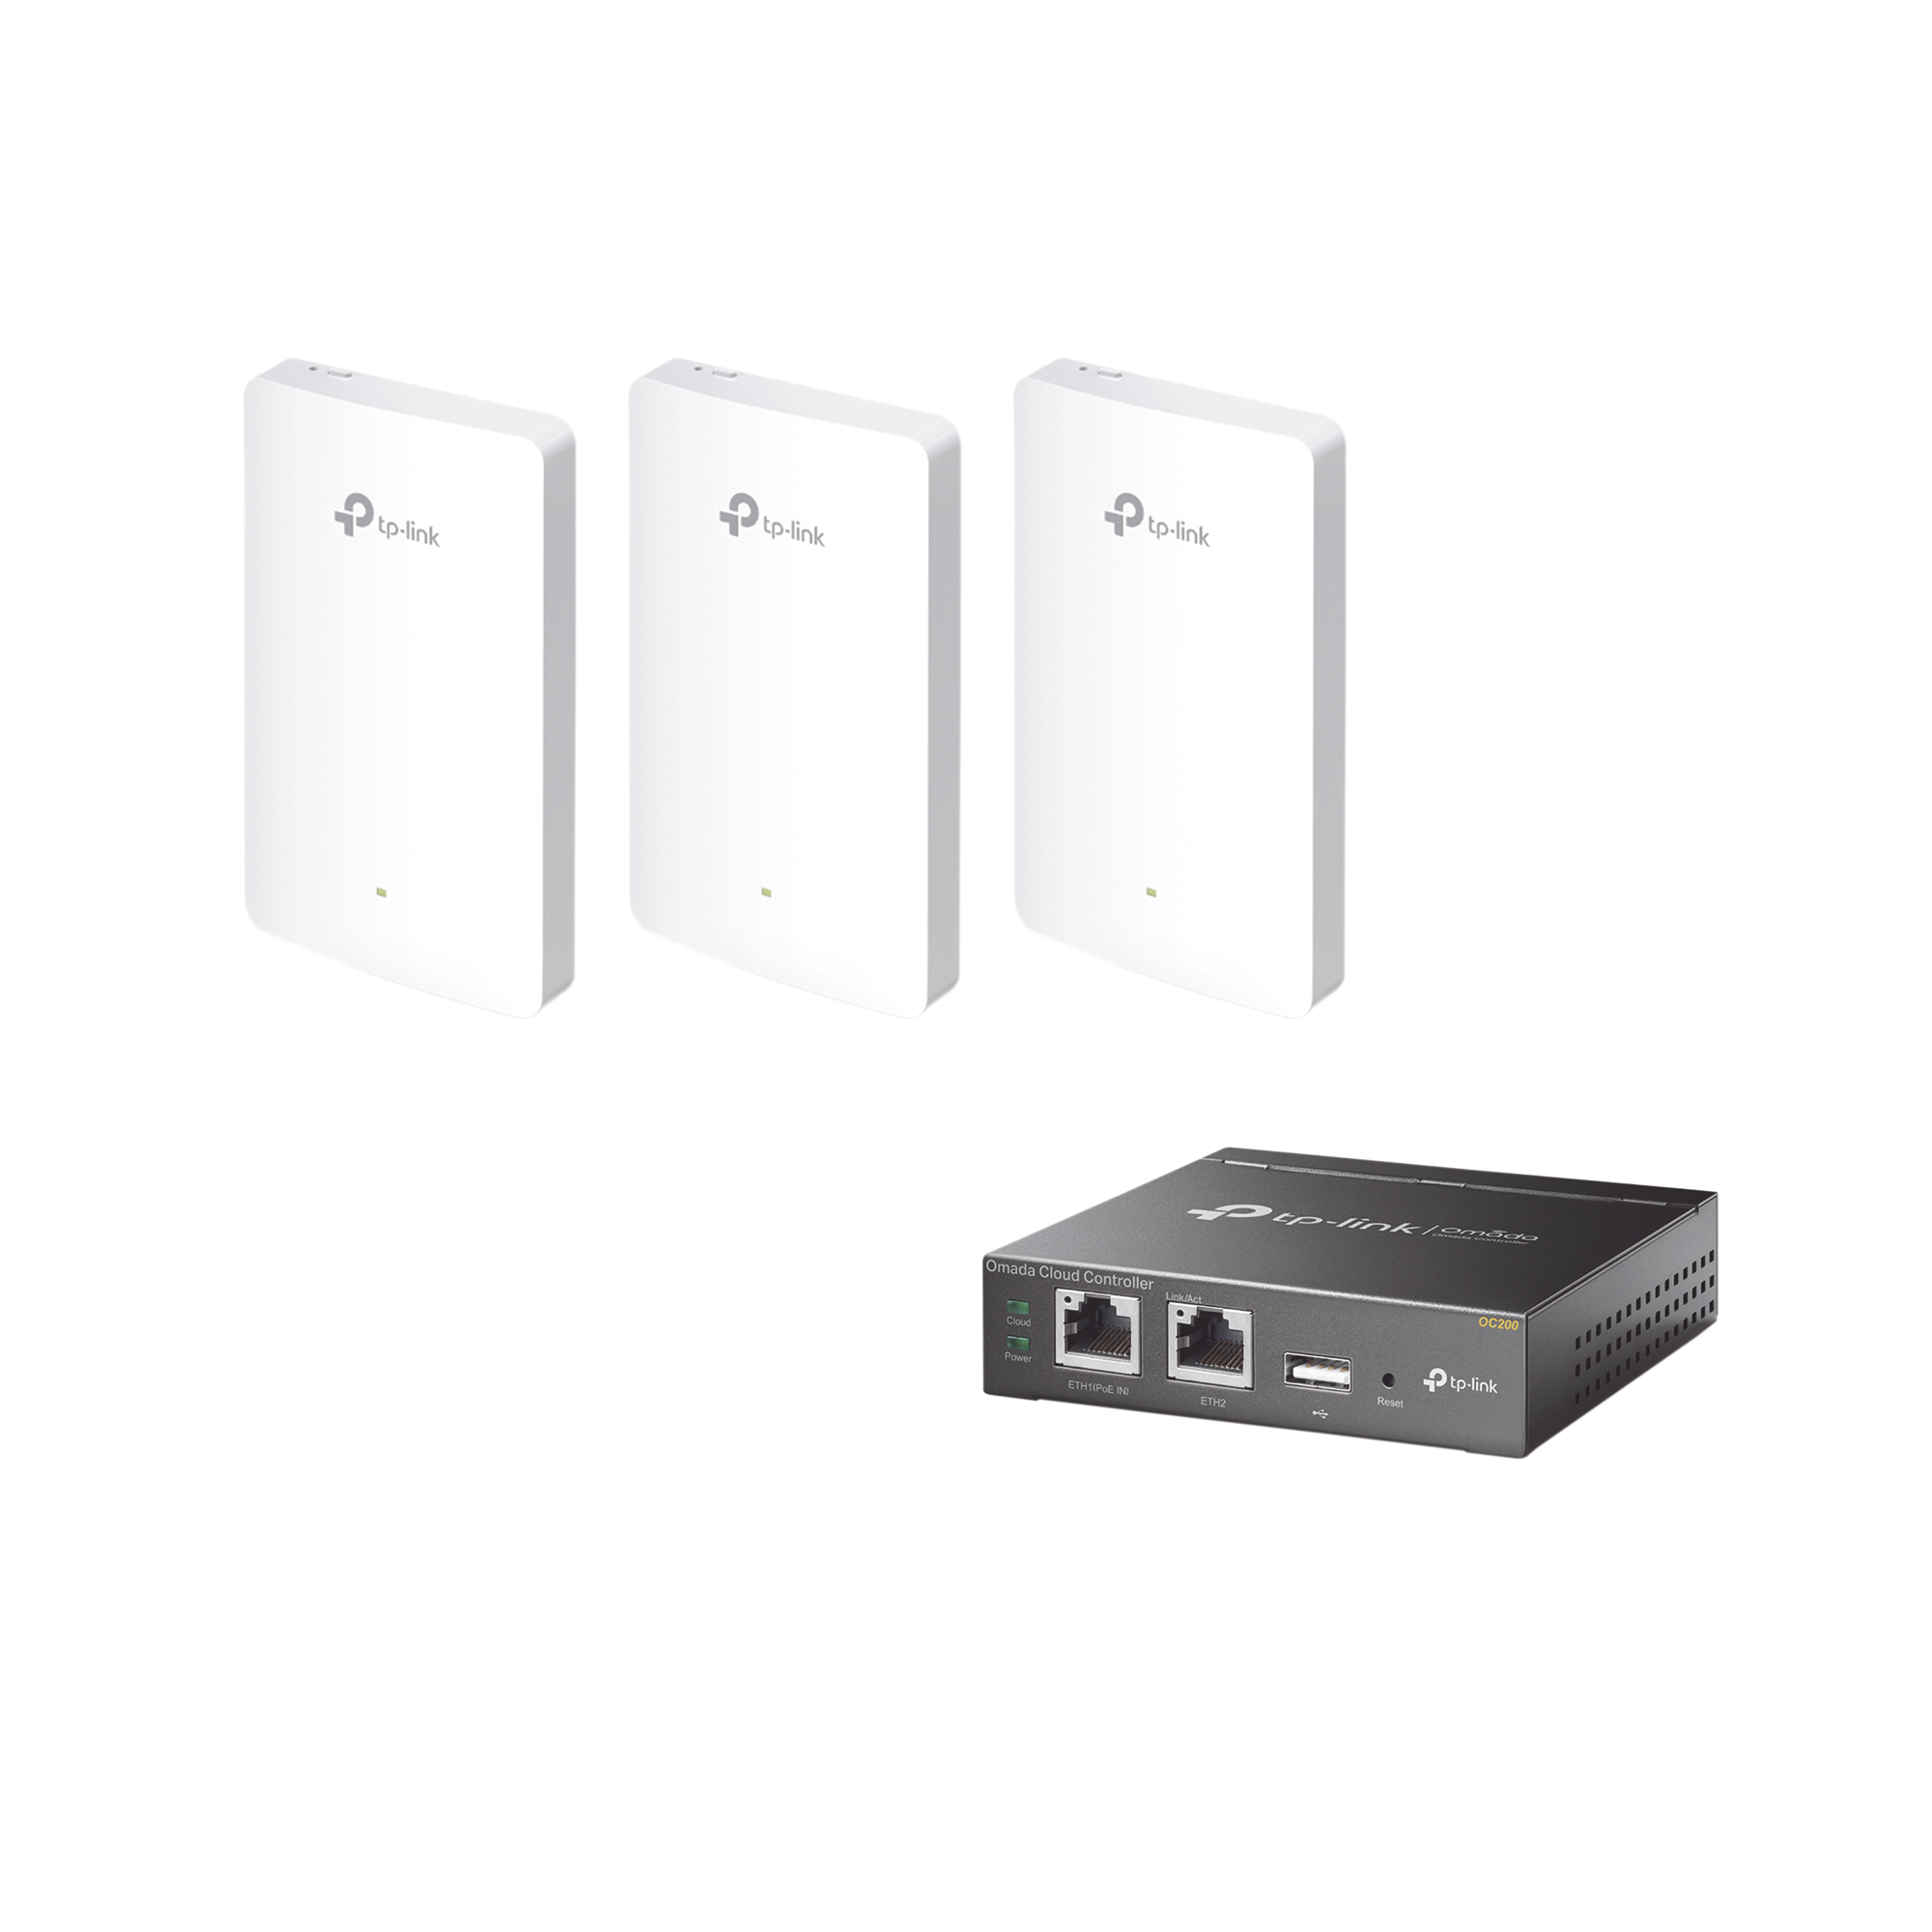 Kit de 3 Puntos de acceso Omada, 1 Controlador, doble banda 802.11ac, PoE 802.3af/at, MU-MIMO, MIMO 2x2 dise�o placa de pared con tres puertos adicionales, soporta hasta 100 clientes.